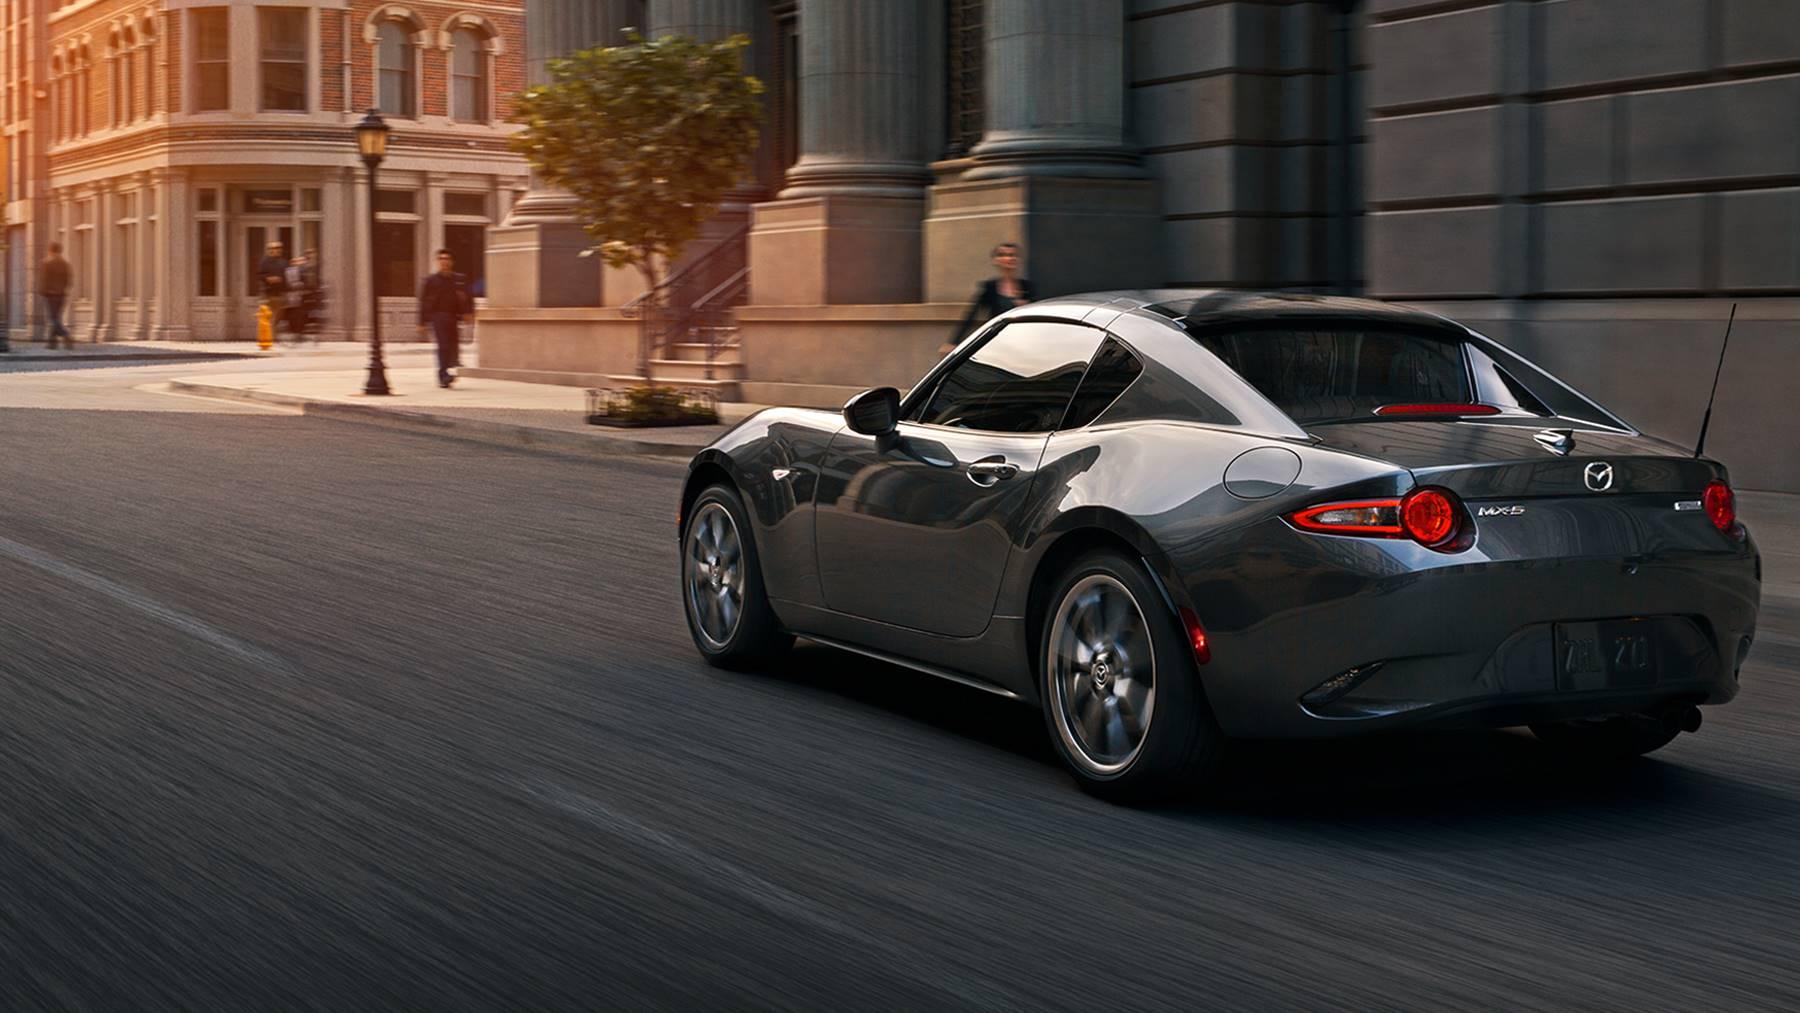 2019 Mazda MX-5 Miata RF for Sale near Austin, TX